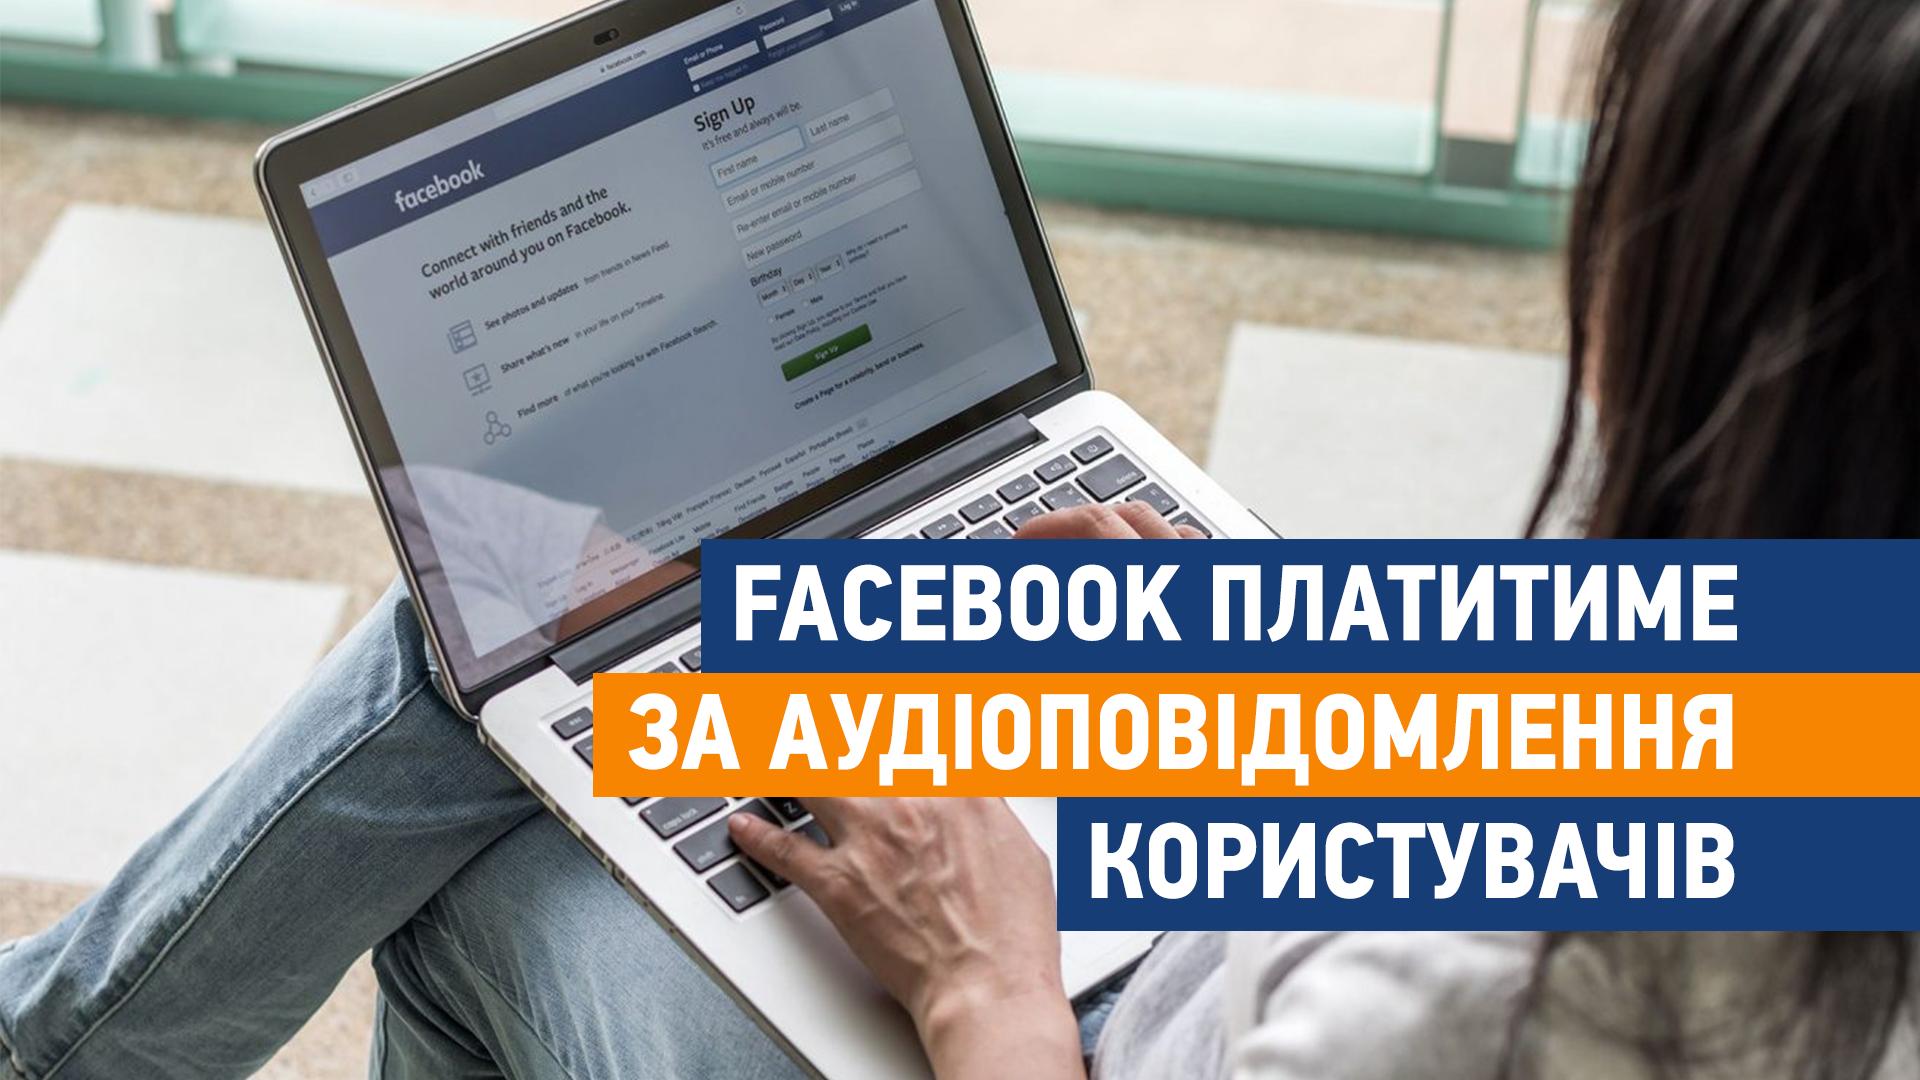 Facebook платитиме за аудіоповідомлення користувачів - Microsoft, google, Facebook, Apple, Amazon - facebook poglyad